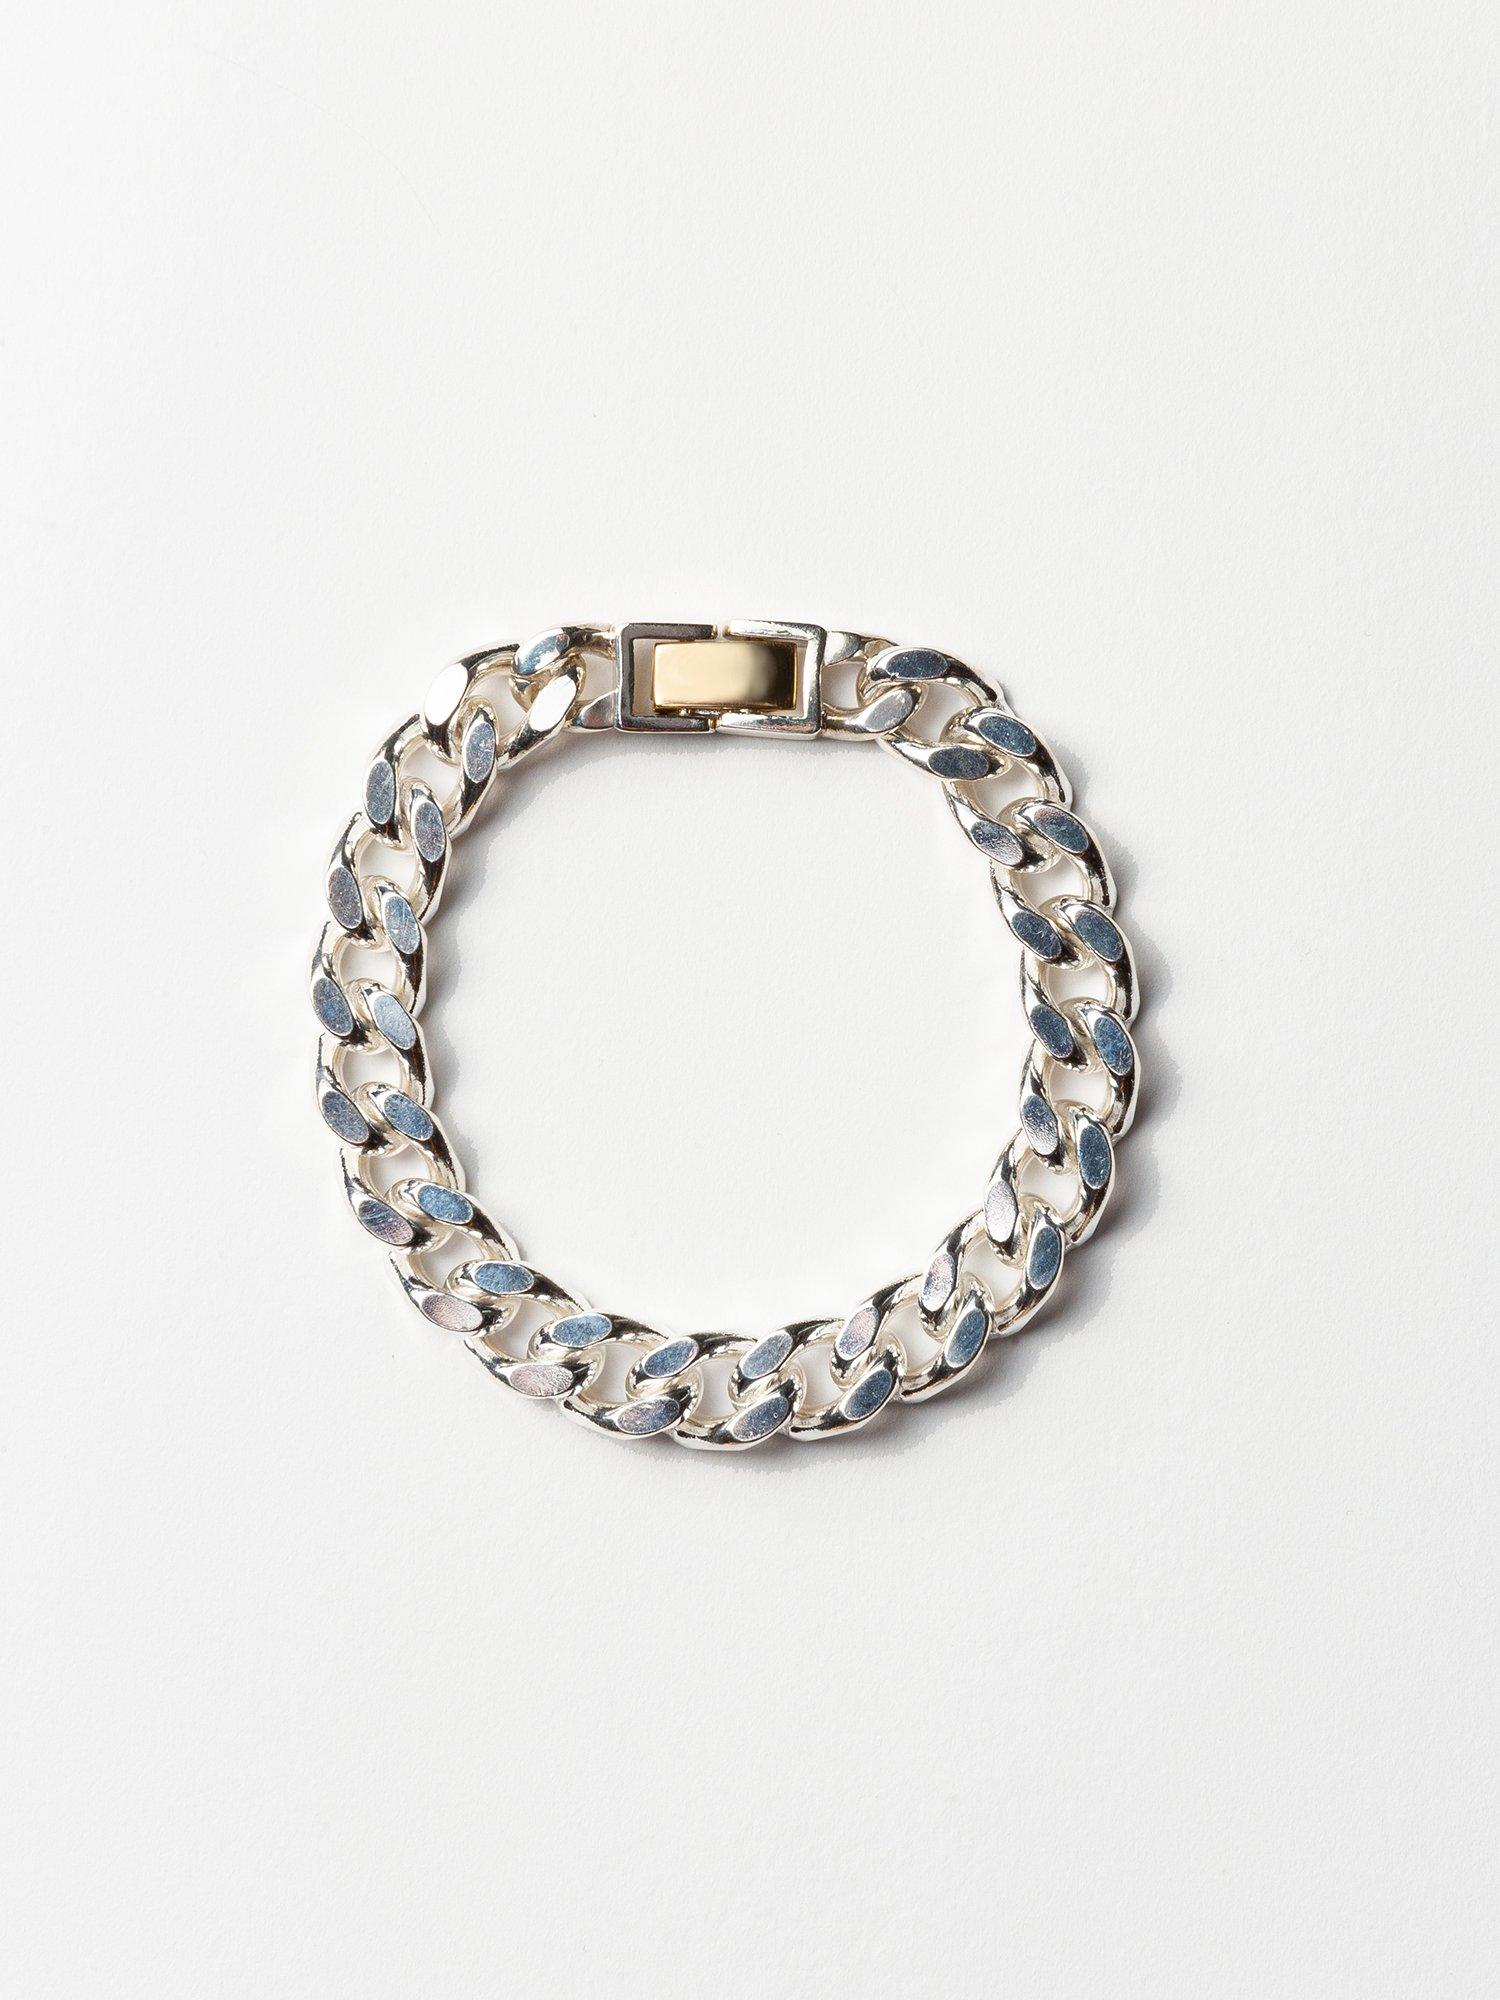 ARTEMIS / Gourmette bracelet / 200mm